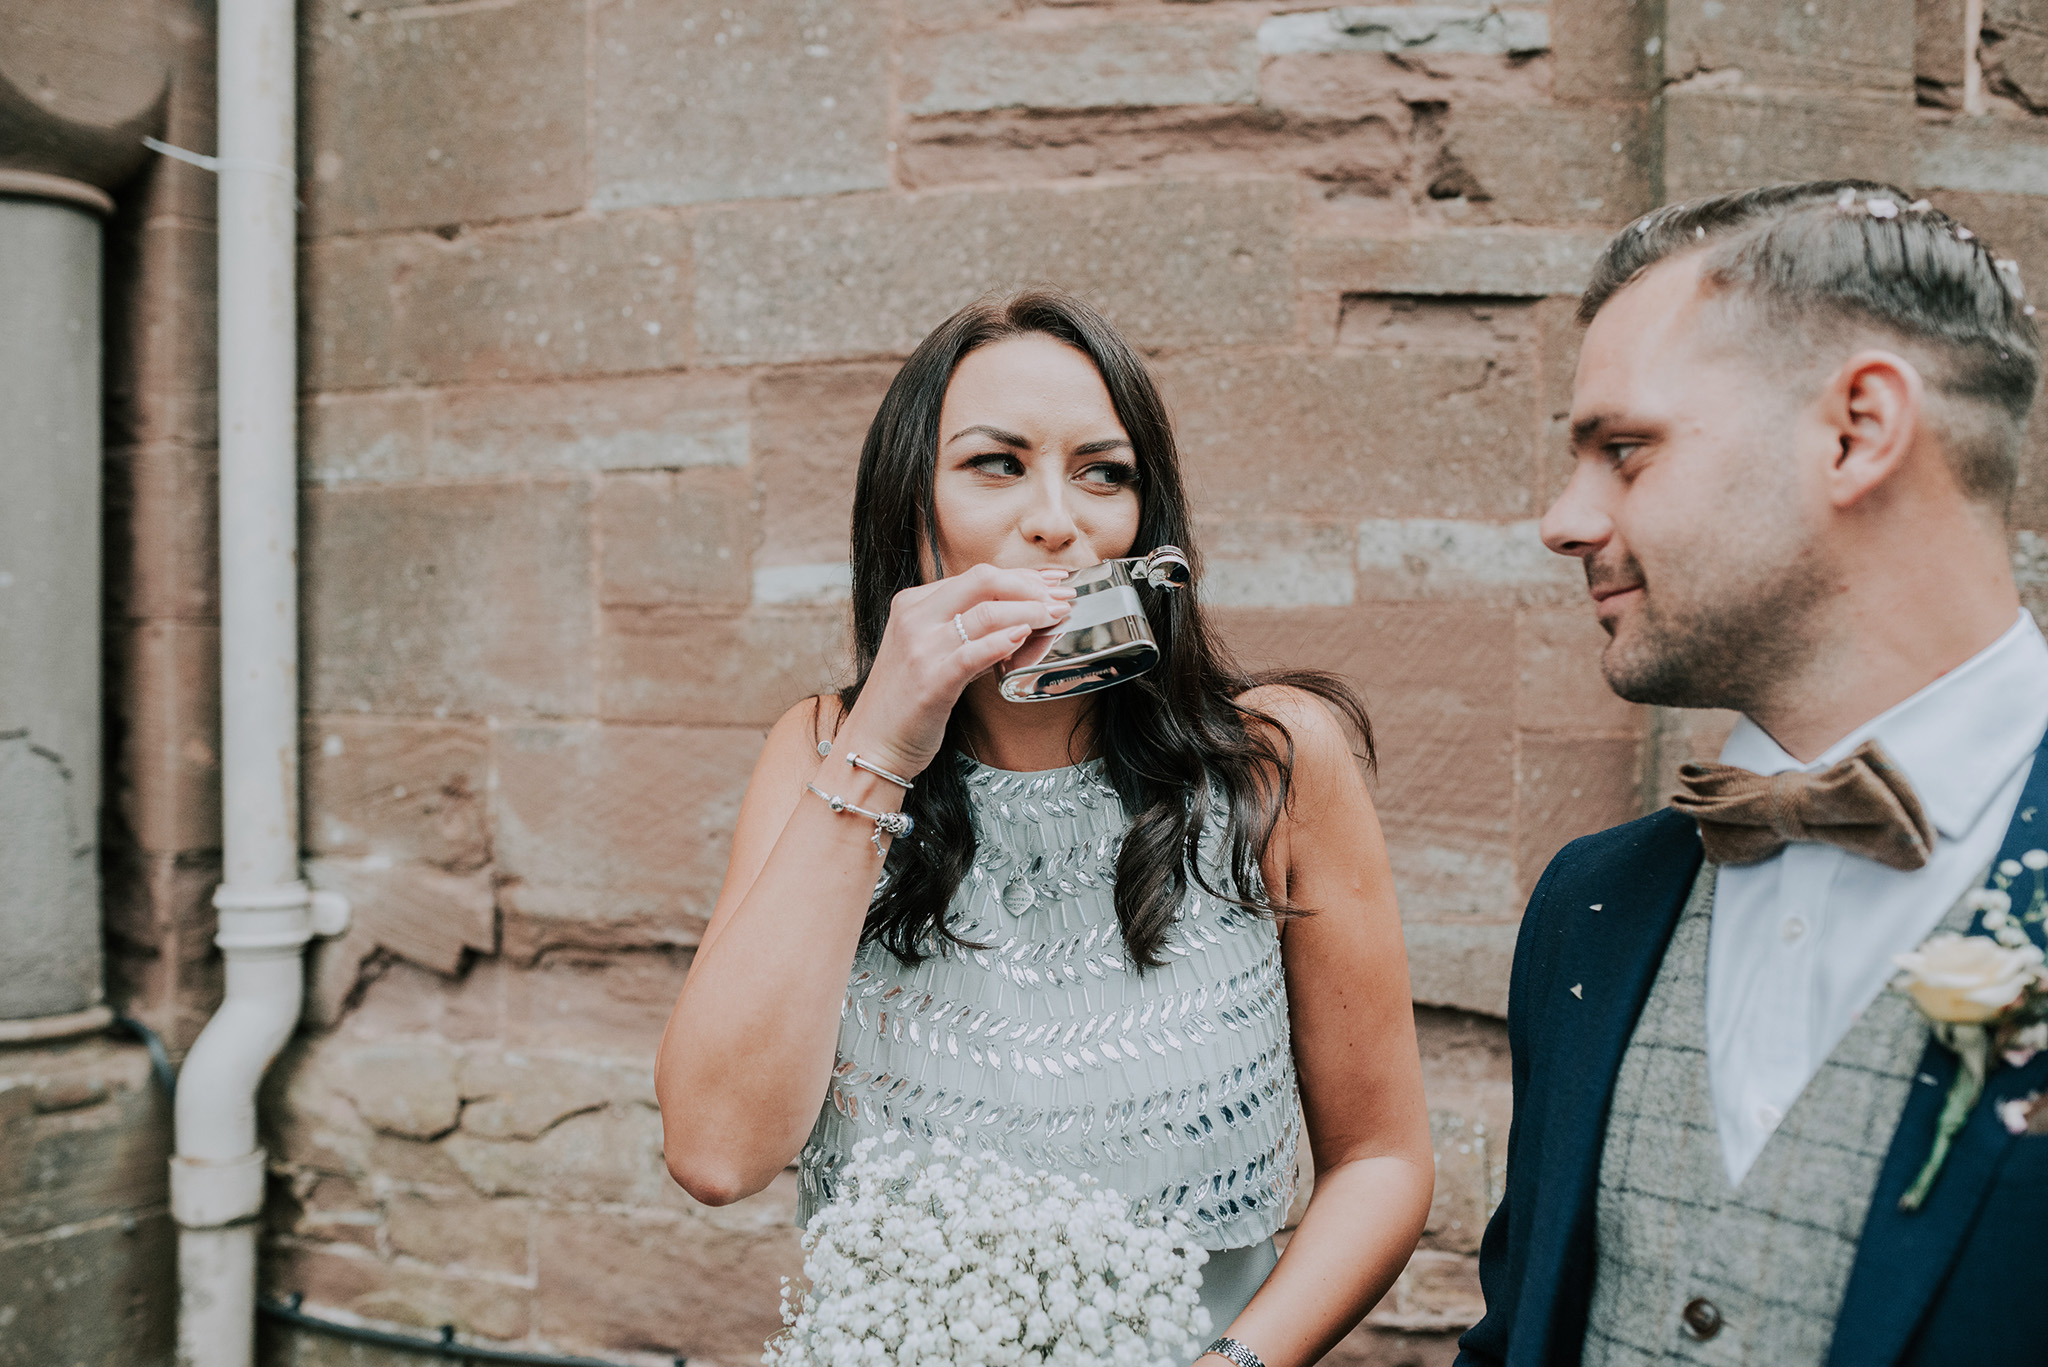 scott-stockwell-photography-wedding-002.jpg